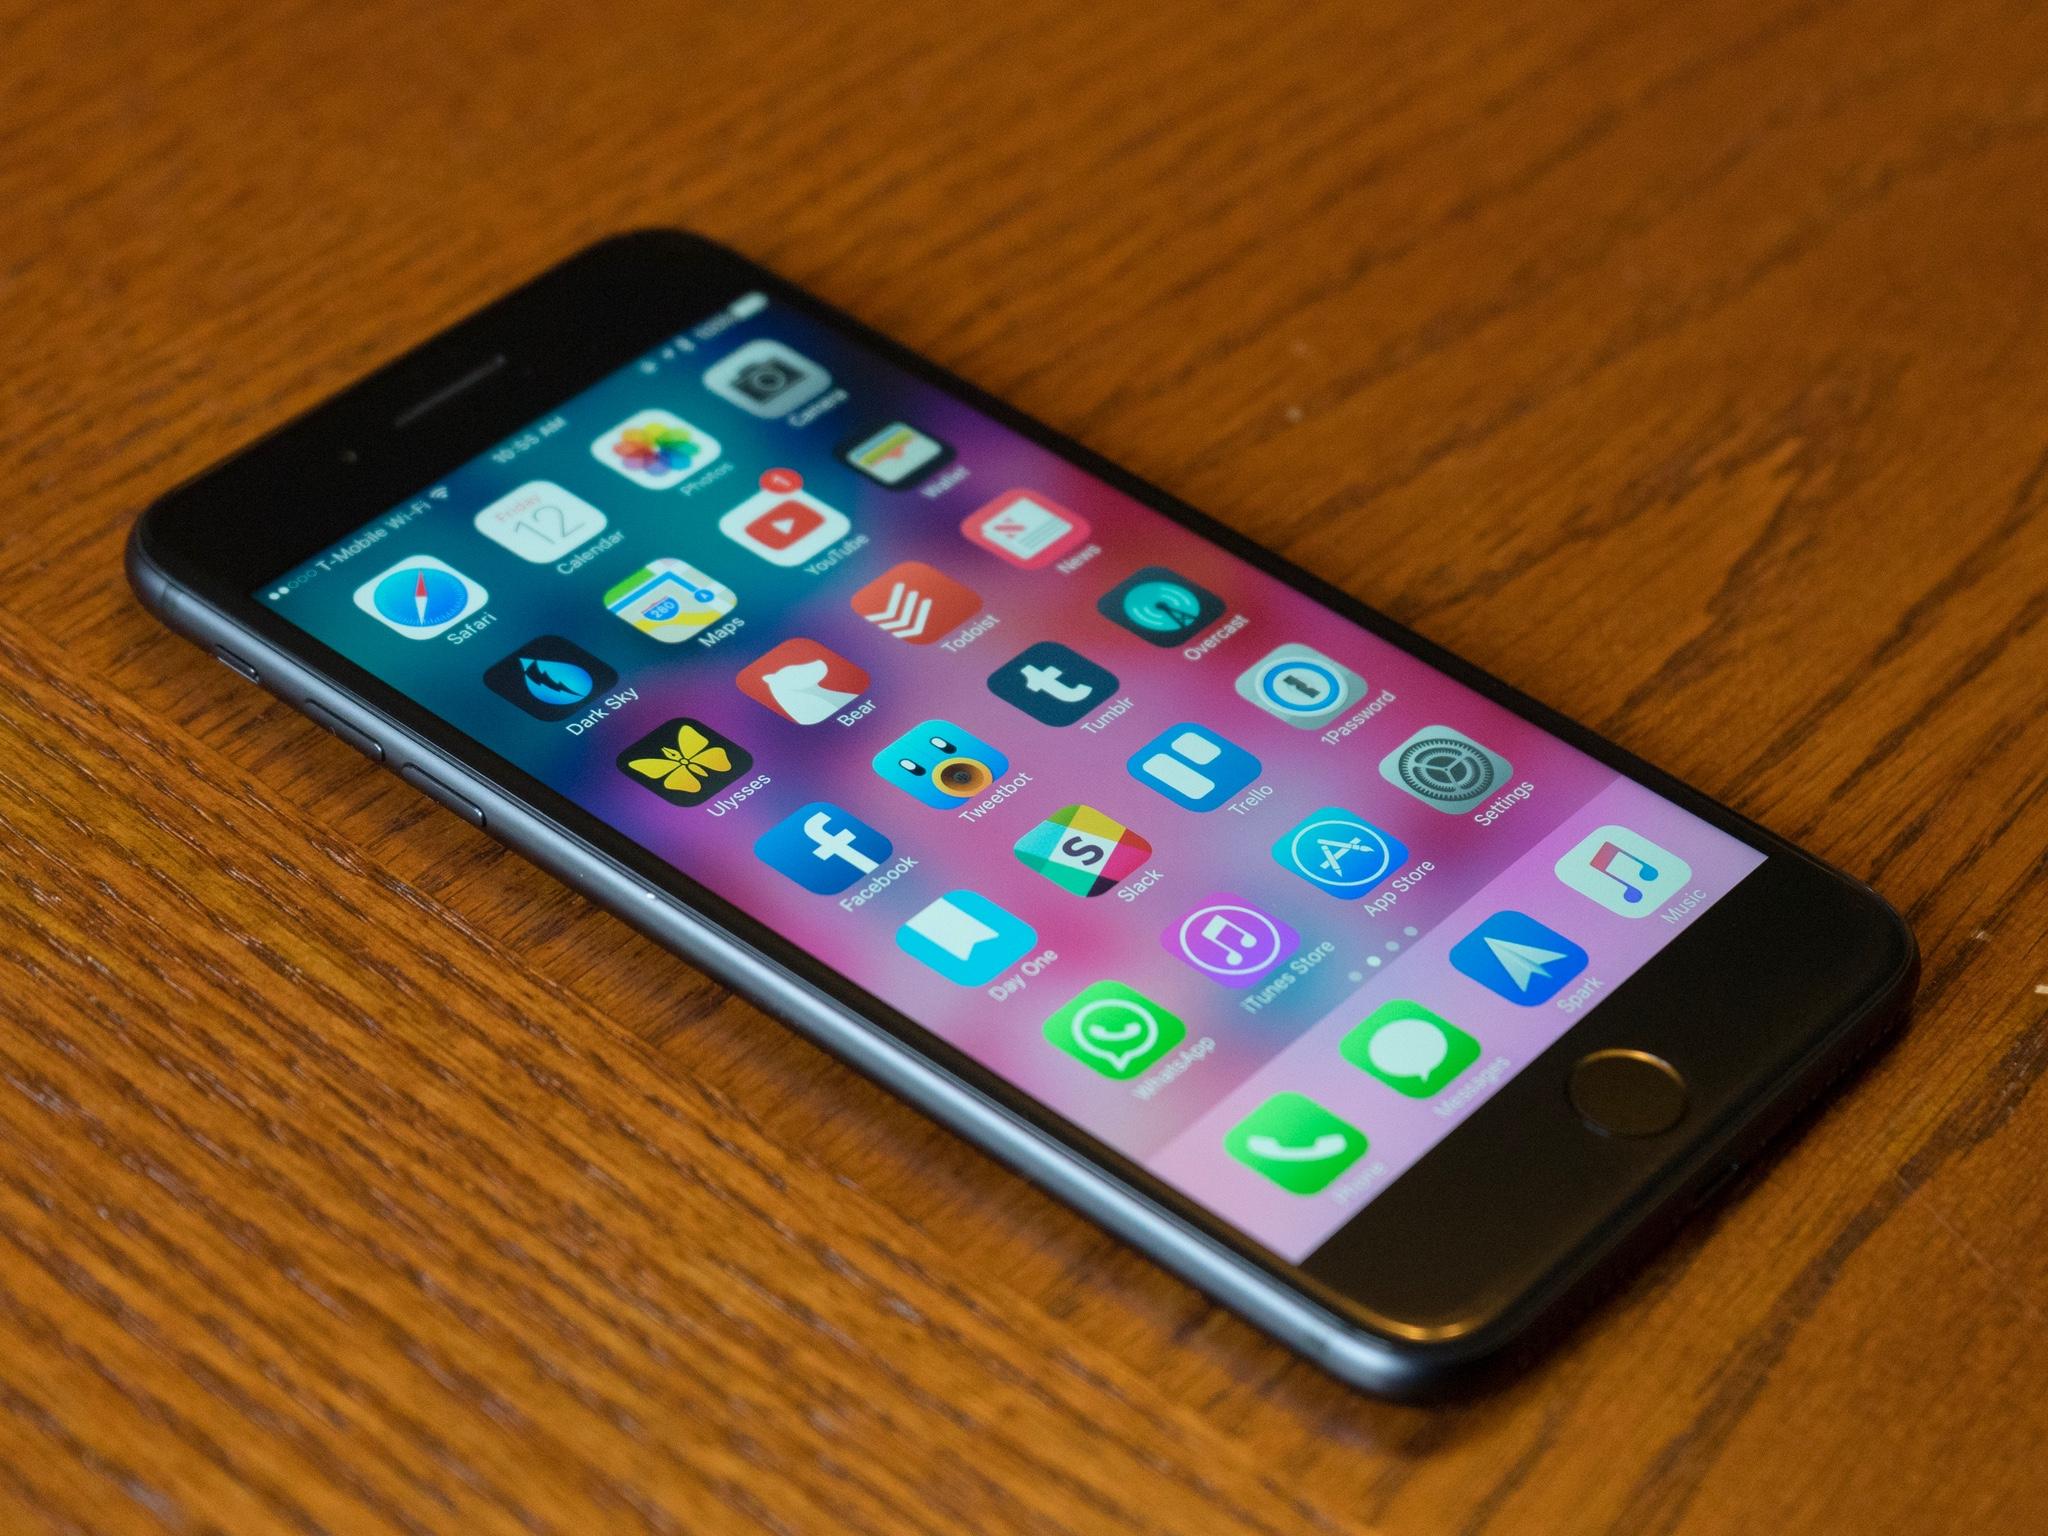 iOS 12 rumor roundup: What's coming next! | iMore